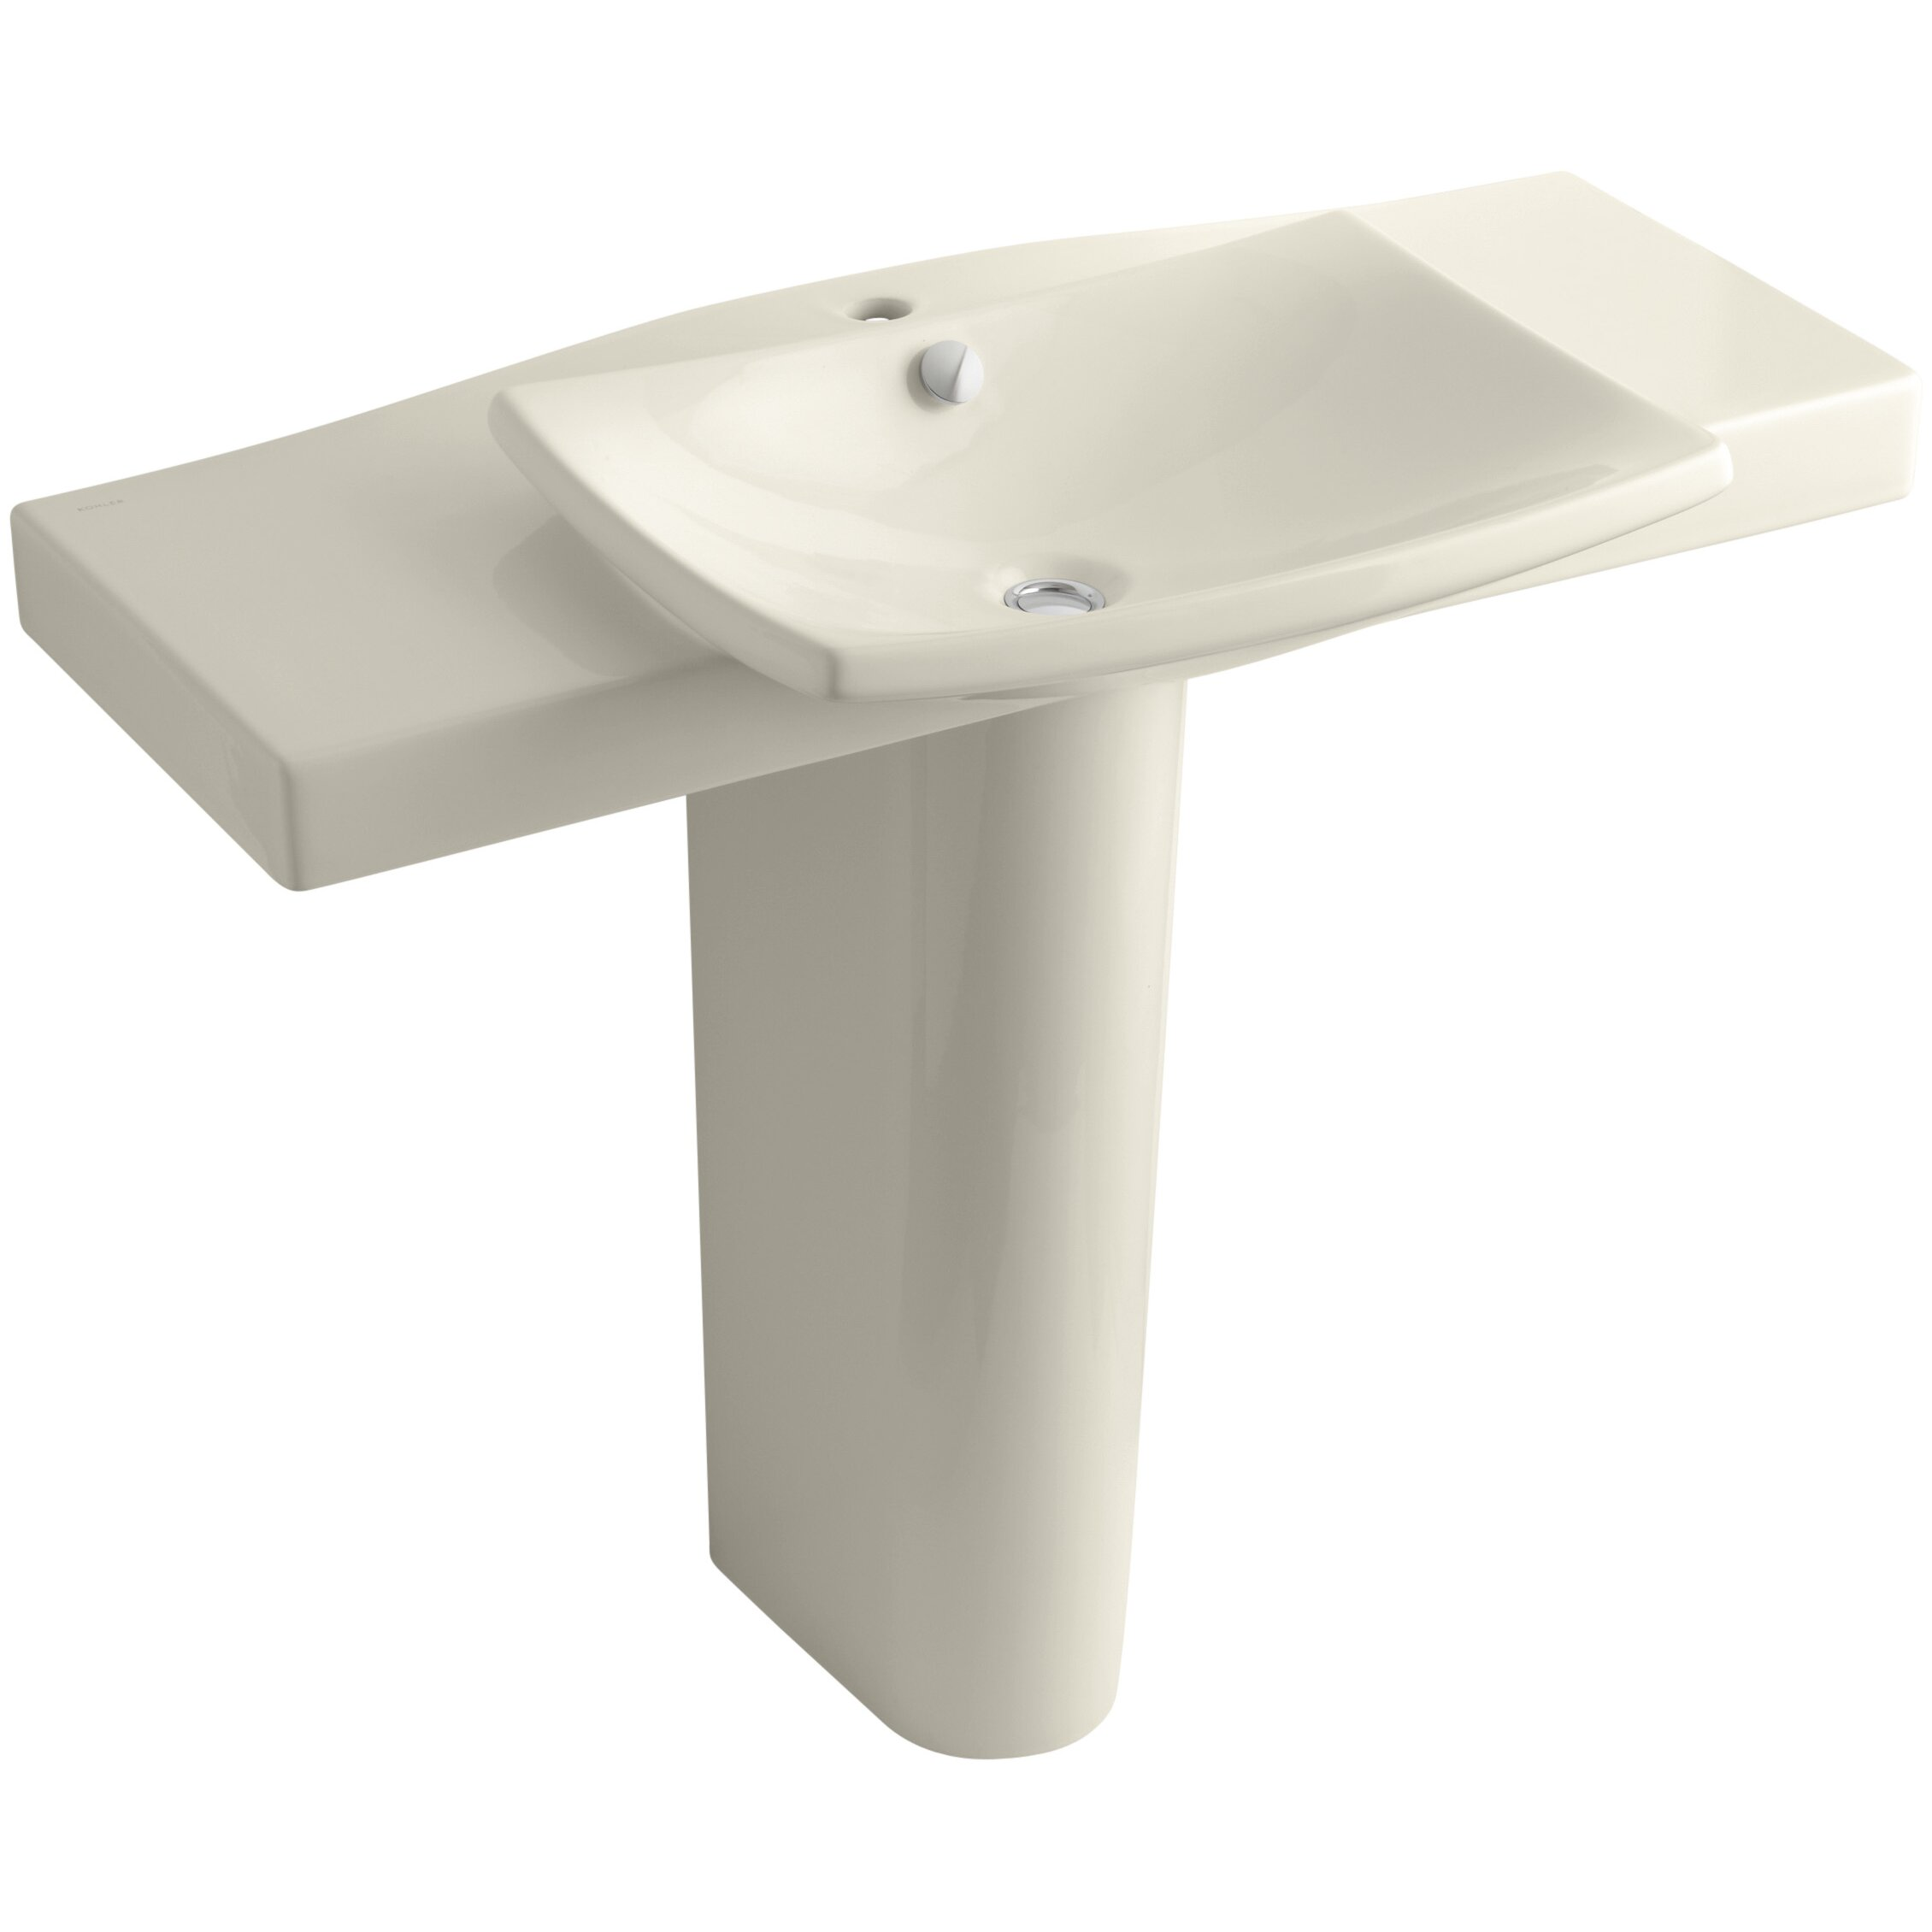 Bathroom Vanities Bathroom Sinks Bathroom Faucets Bathtubs Showers ...